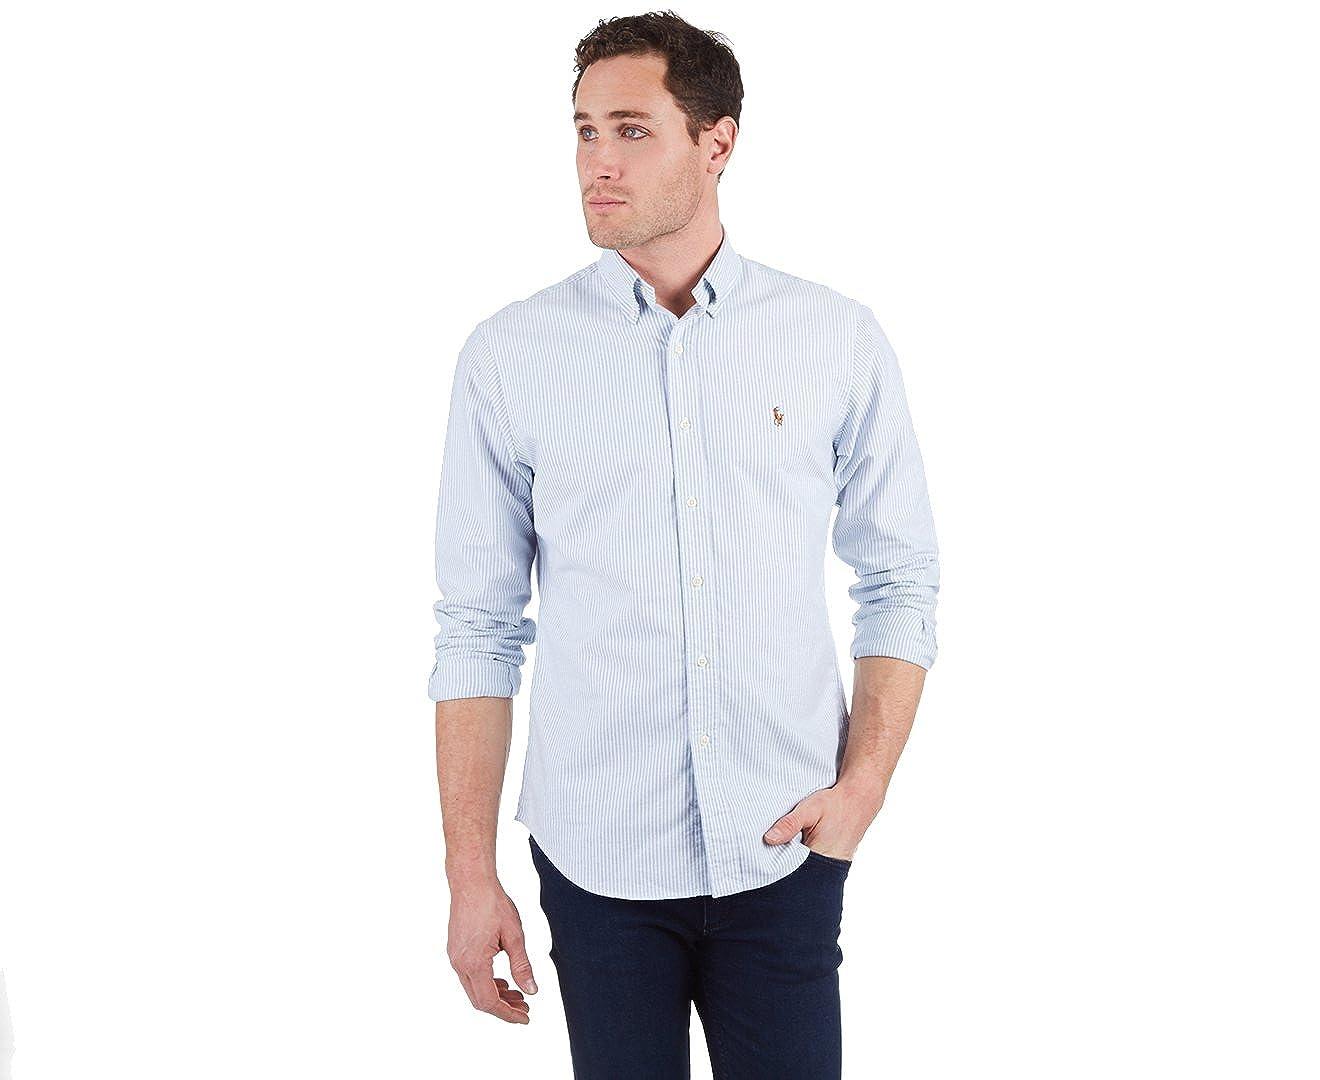 b256acaa9567 RALPH LAUREN Polo Mens Slim Fit Stripe Shirt, White/Blue (L) at Amazon  Men's Clothing store: